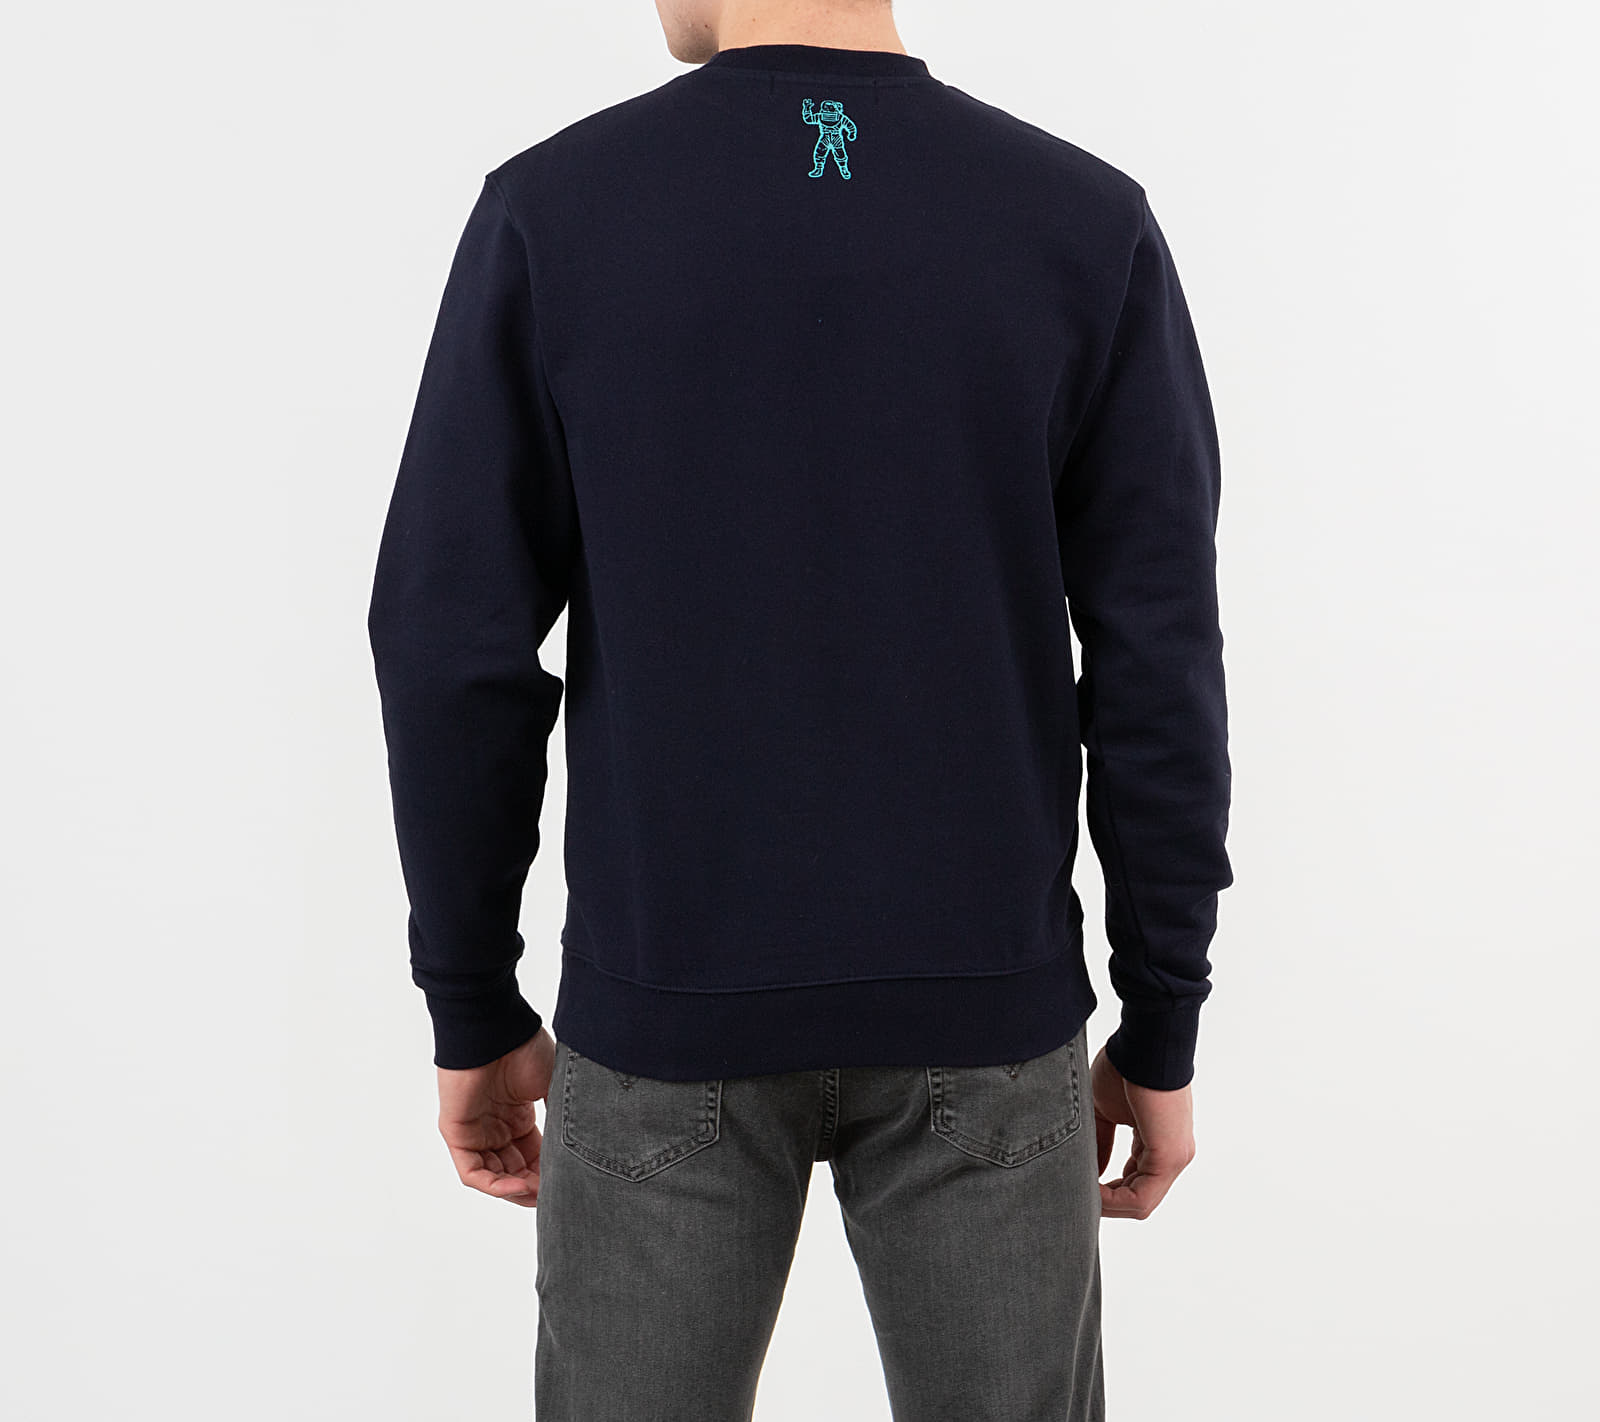 Billionaire Boys Club Embroidered Logo Crewneck Navy, Blue